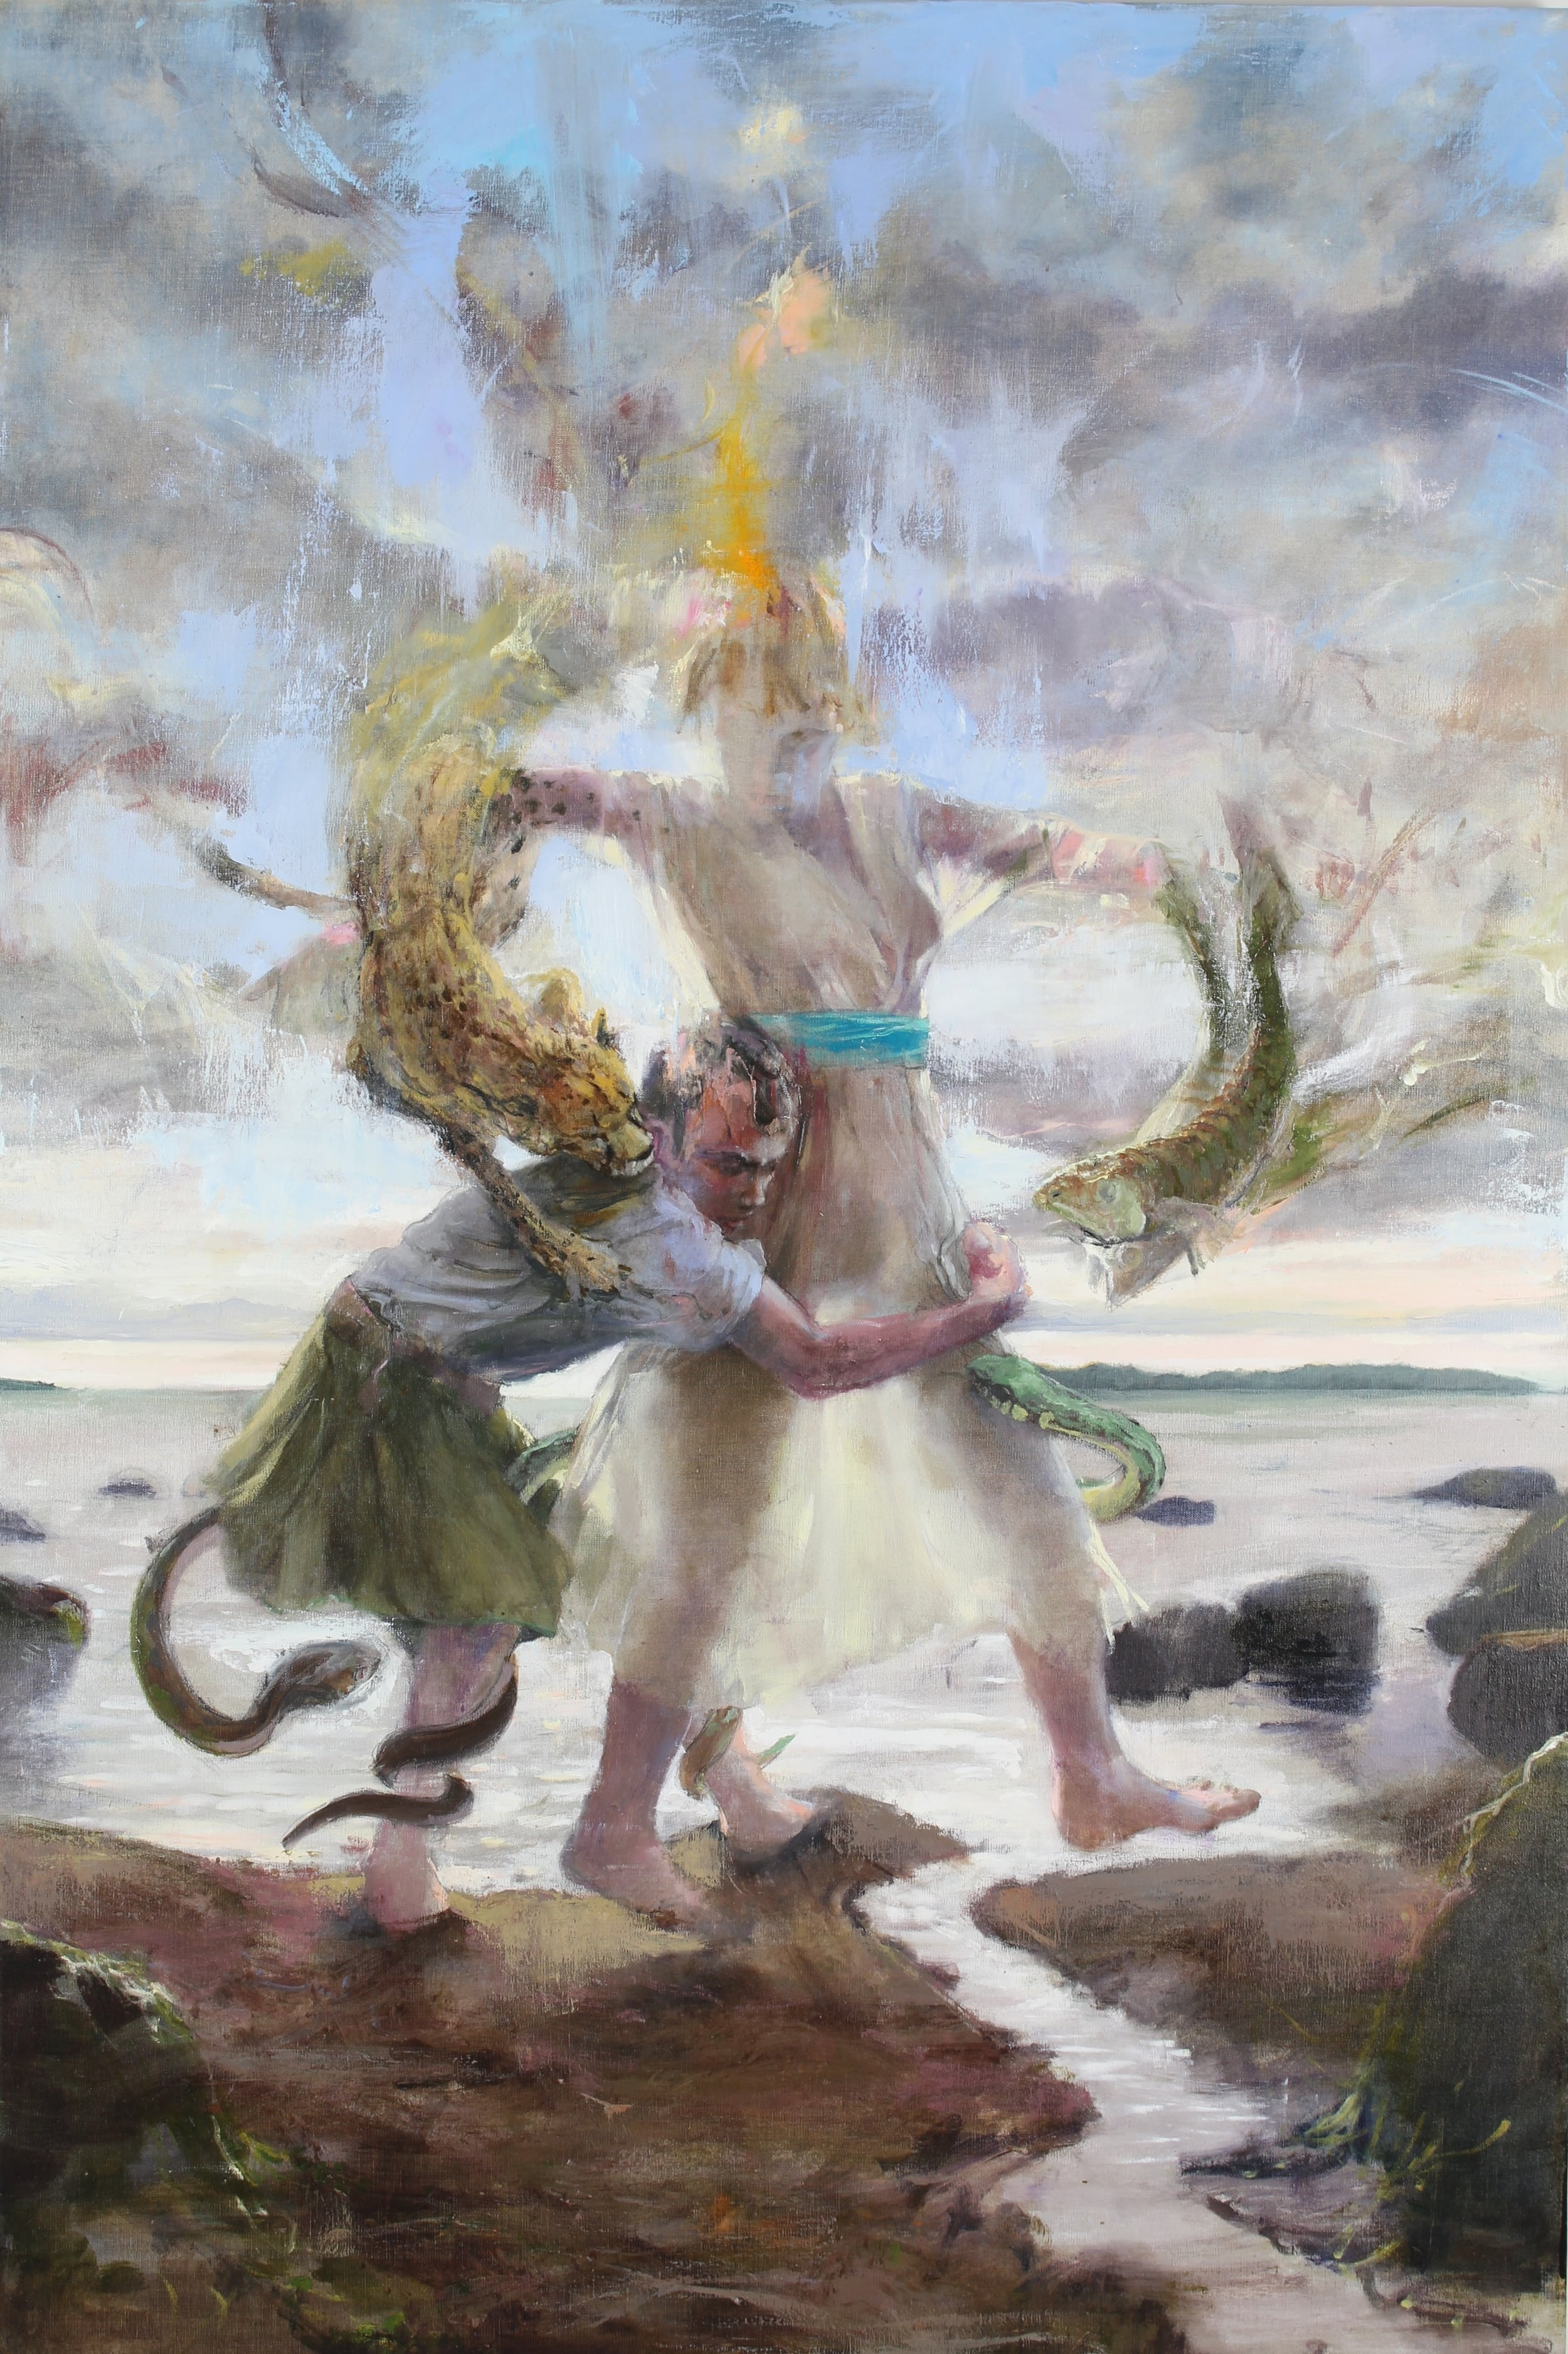 Peleus & Thetis , 2015 oil on canvas, 60 x 40 inches